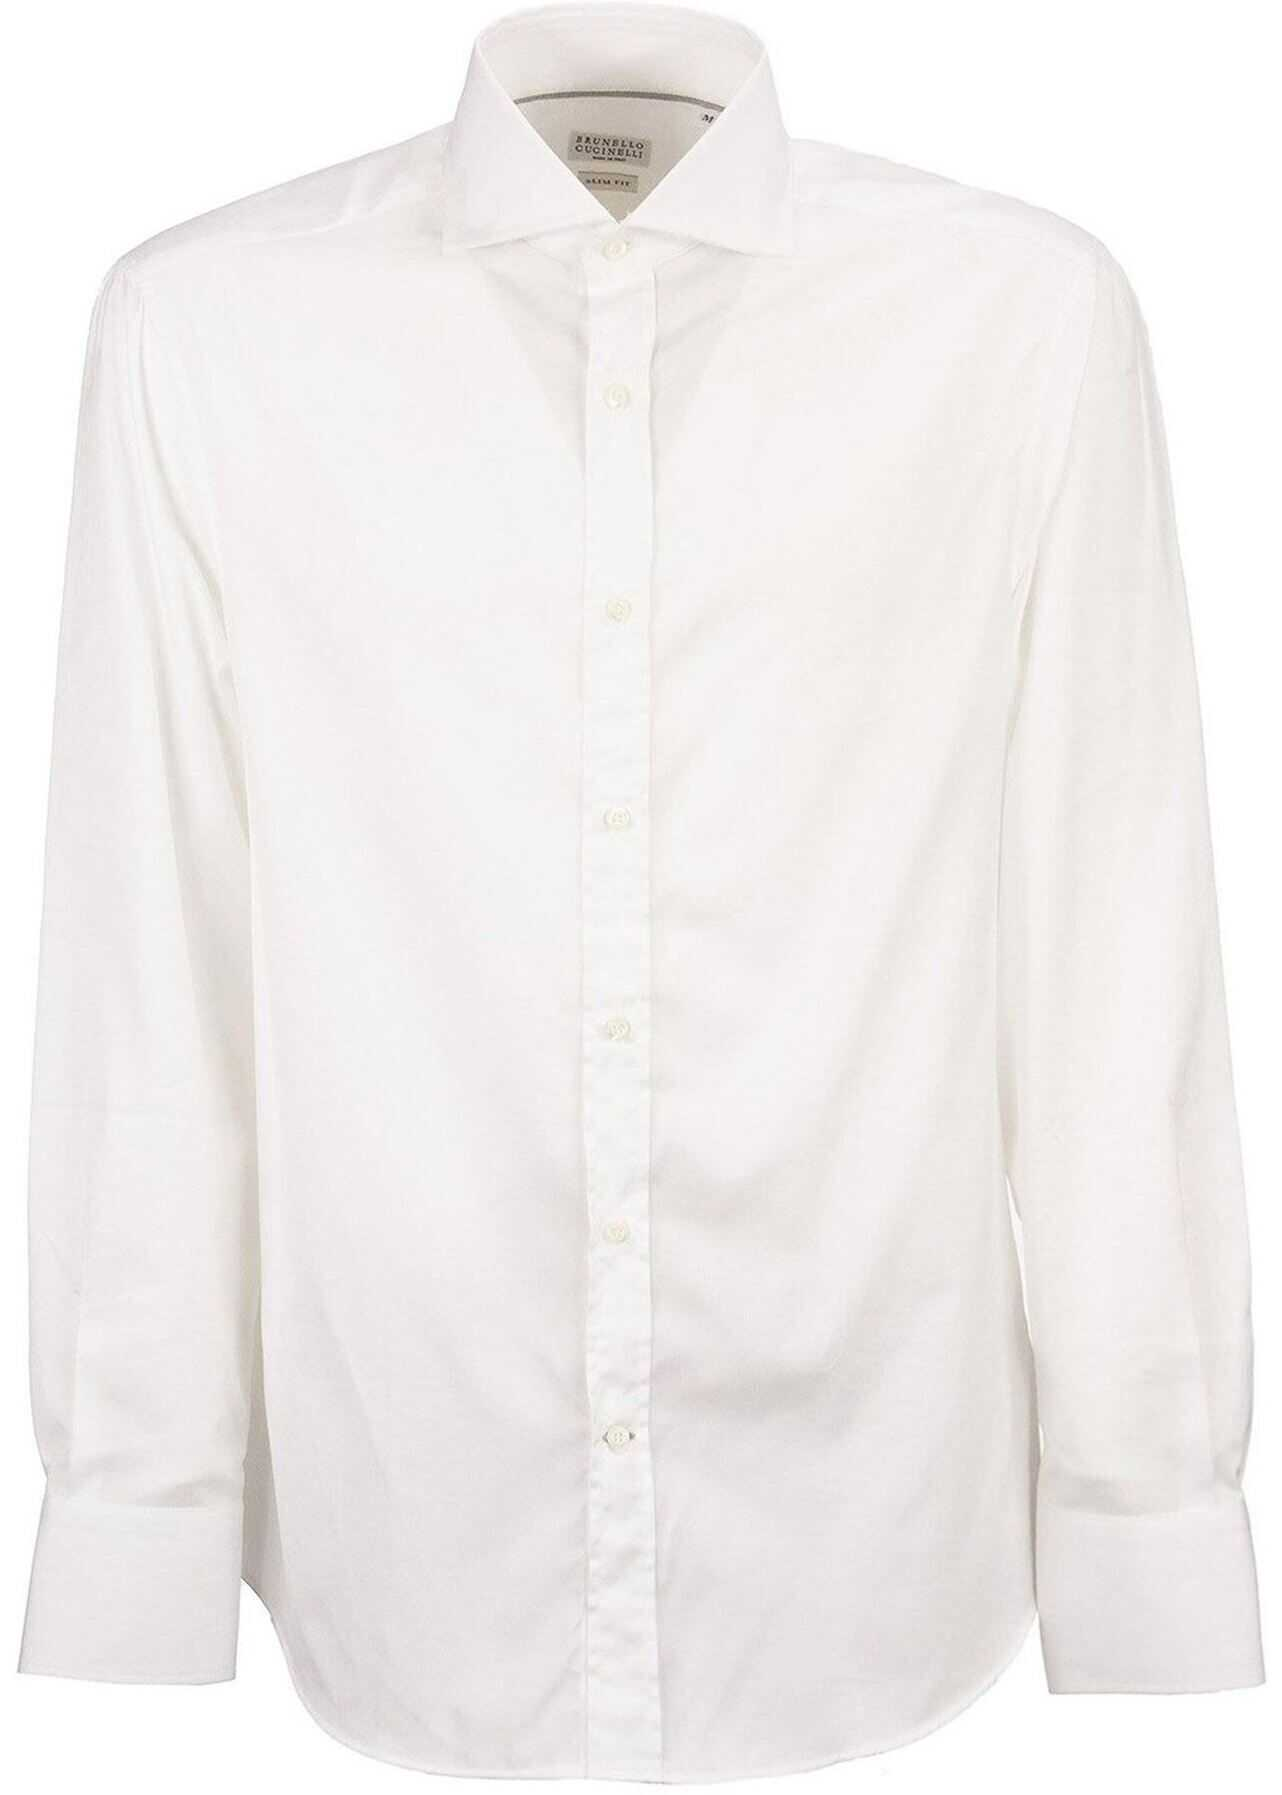 Brunello Cucinelli Poplin Shirt White imagine